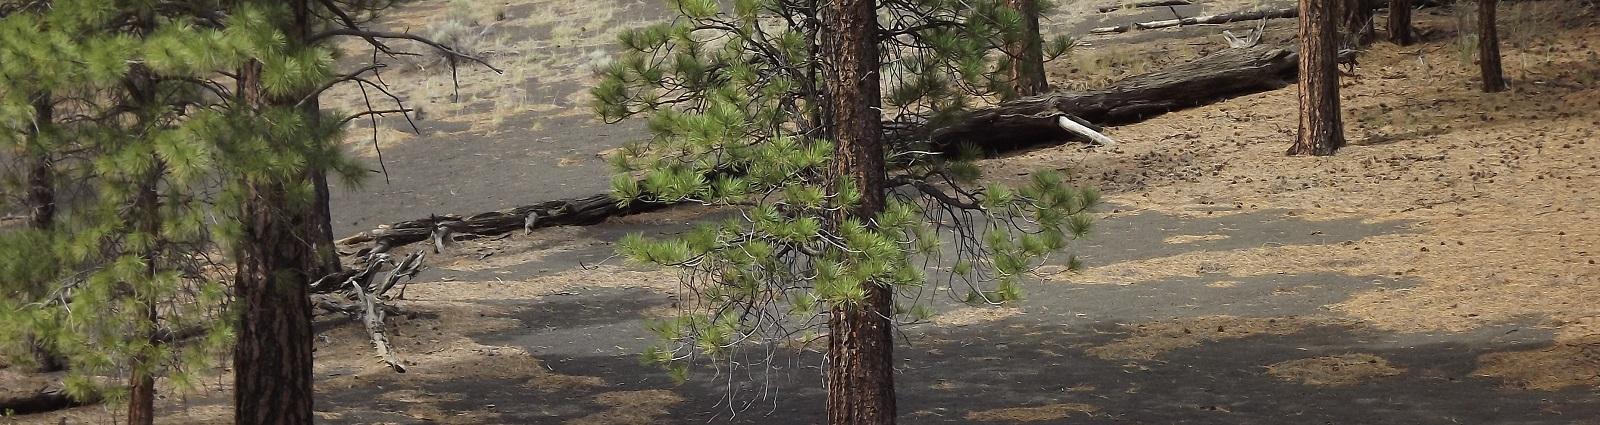 trees-on-hillside